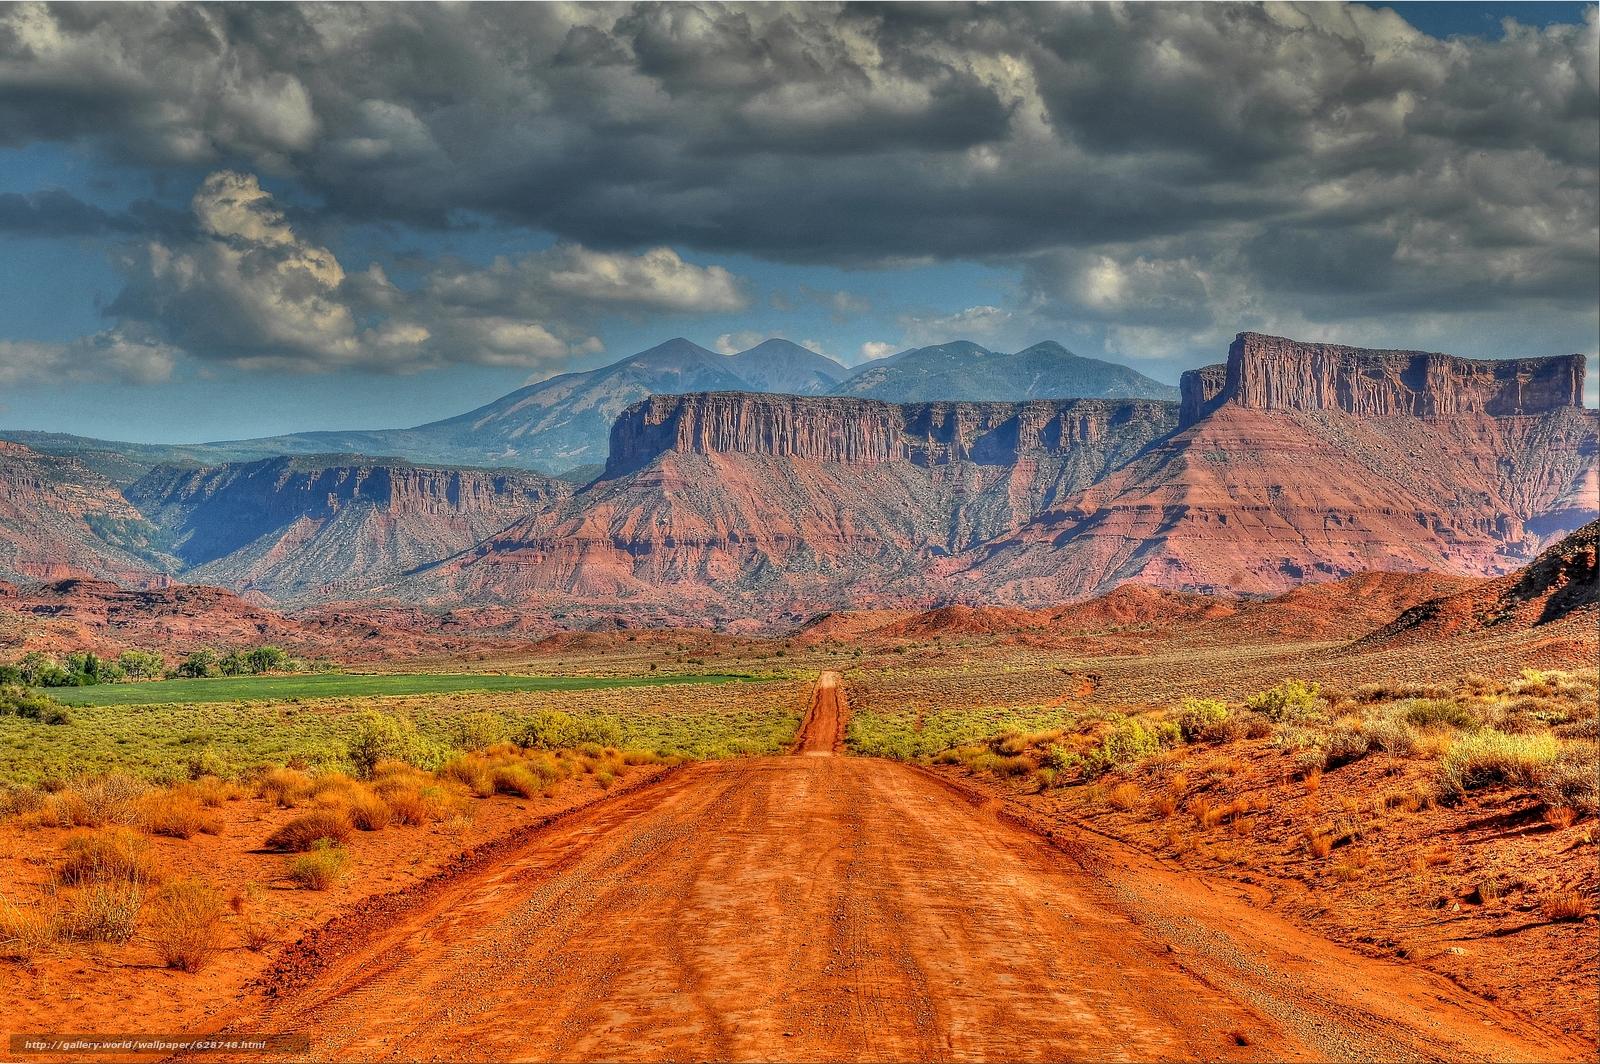 estrada, Utah, Rochas, paisagem, Montanhas